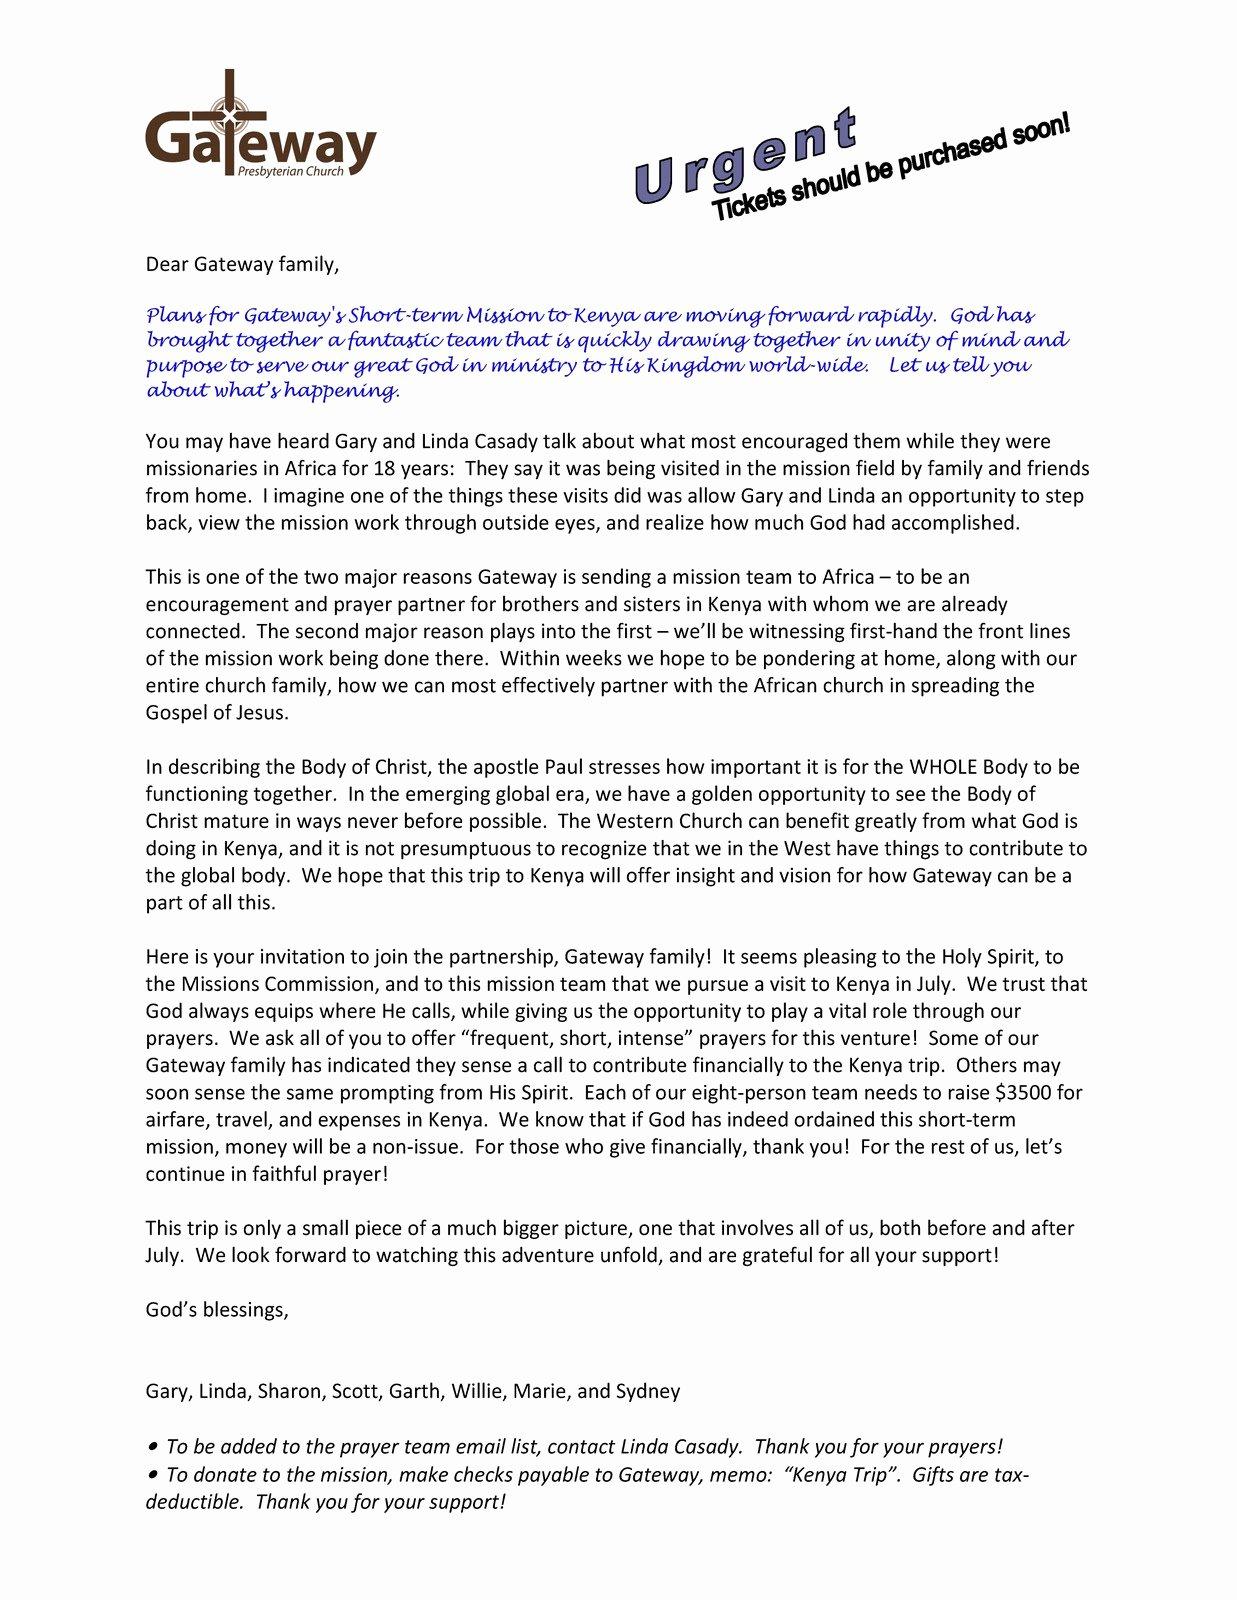 Mission Trip Donation Letter Template New Gateway Kenya Mission Trip April 2010